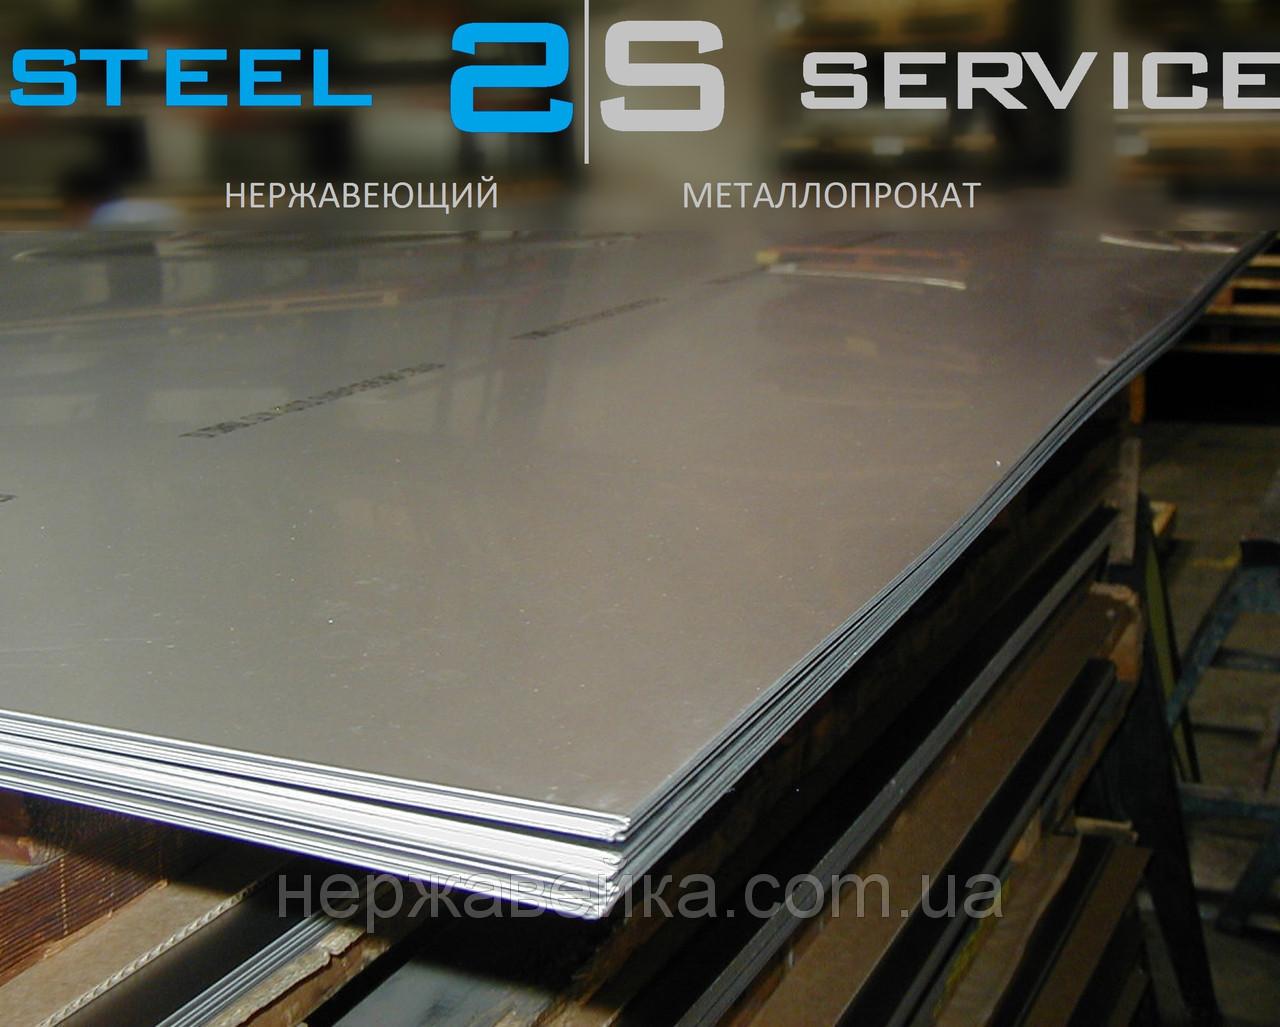 Нержавеющий лист 0,8х1500х3000мм  AISI 316Ti(10Х17Н13М2Т) 2B - матовый,  кислотостойкий